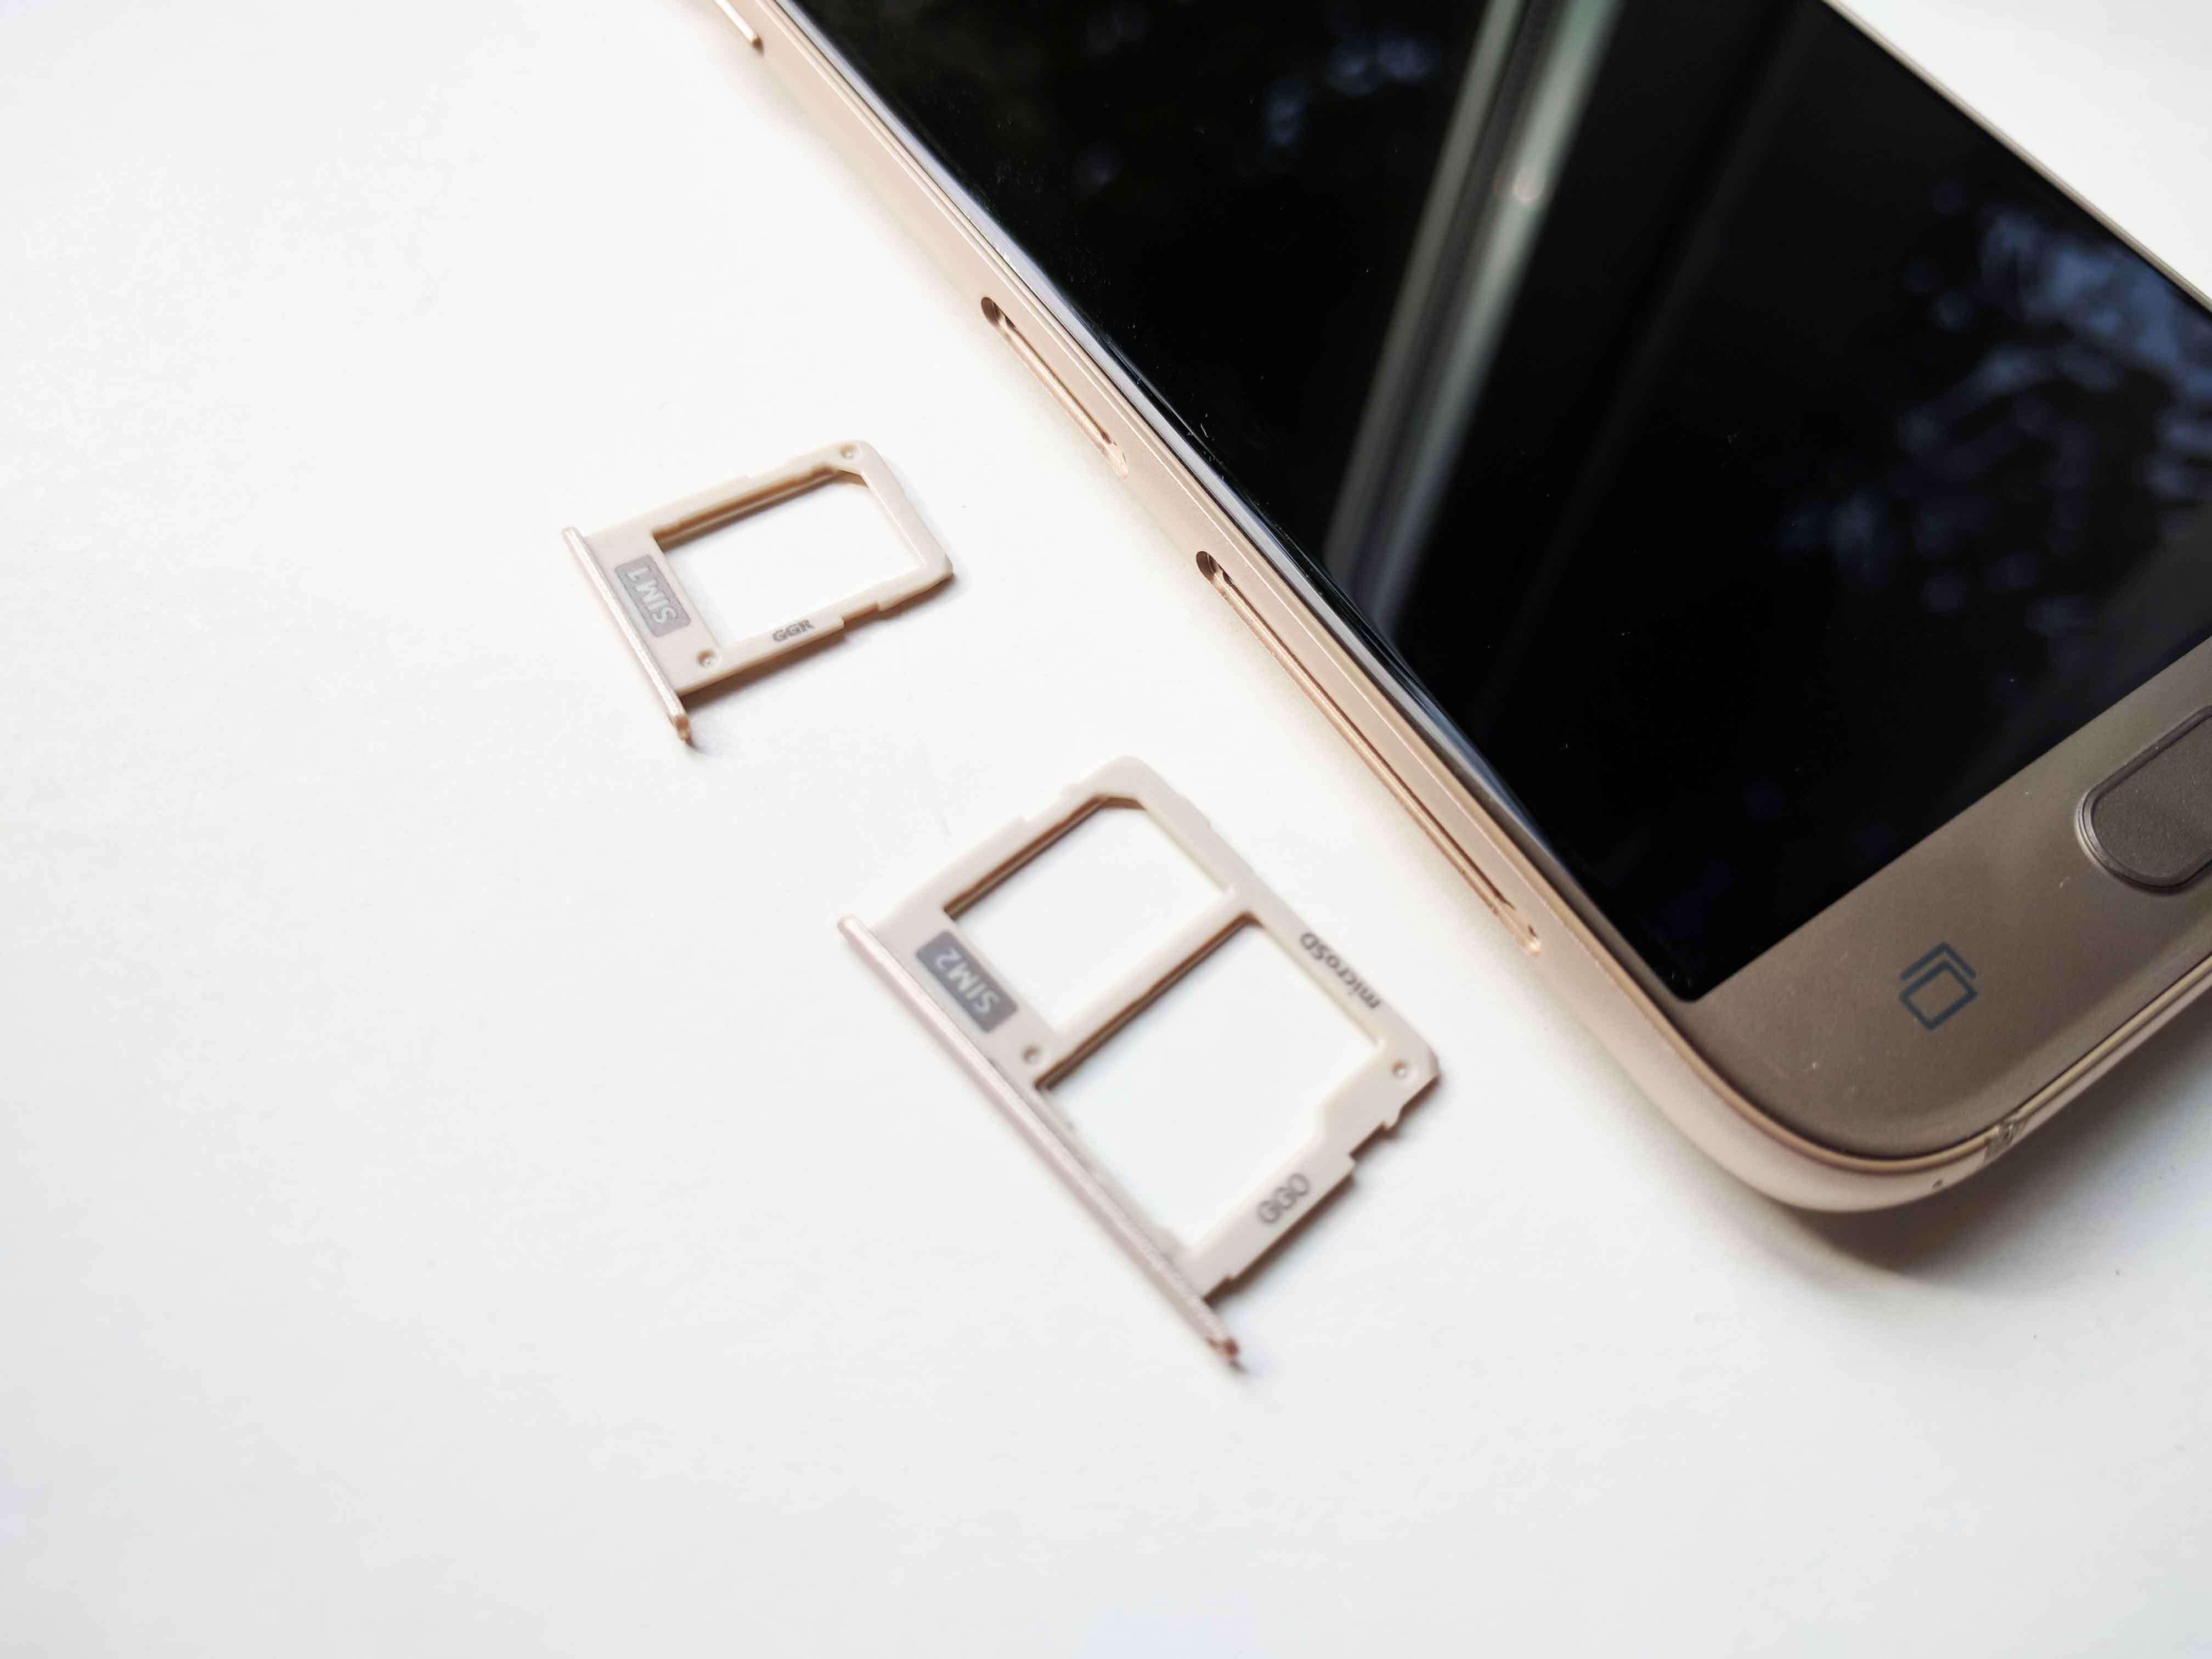 Samsung Galaxy J5 (2017) Review Romana, Pareri - foto 4